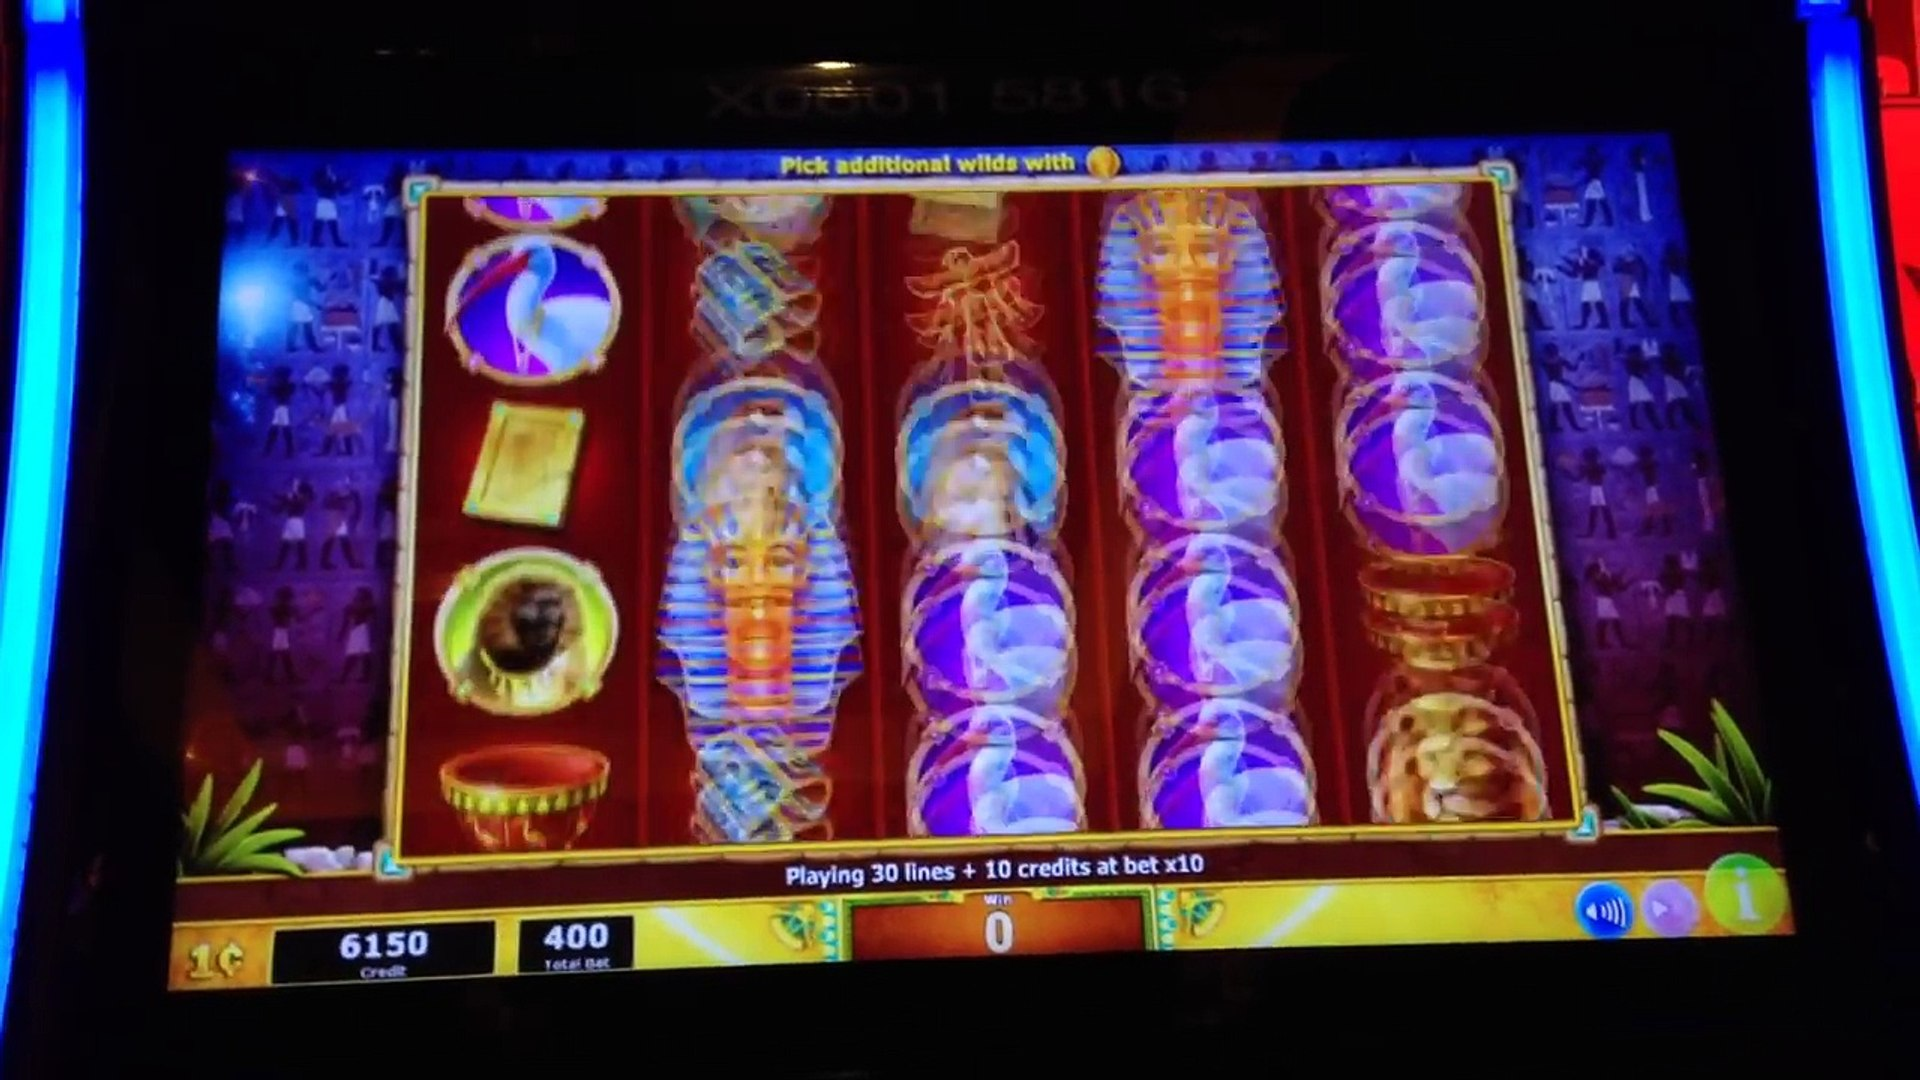 Sphinx slot machine for sale